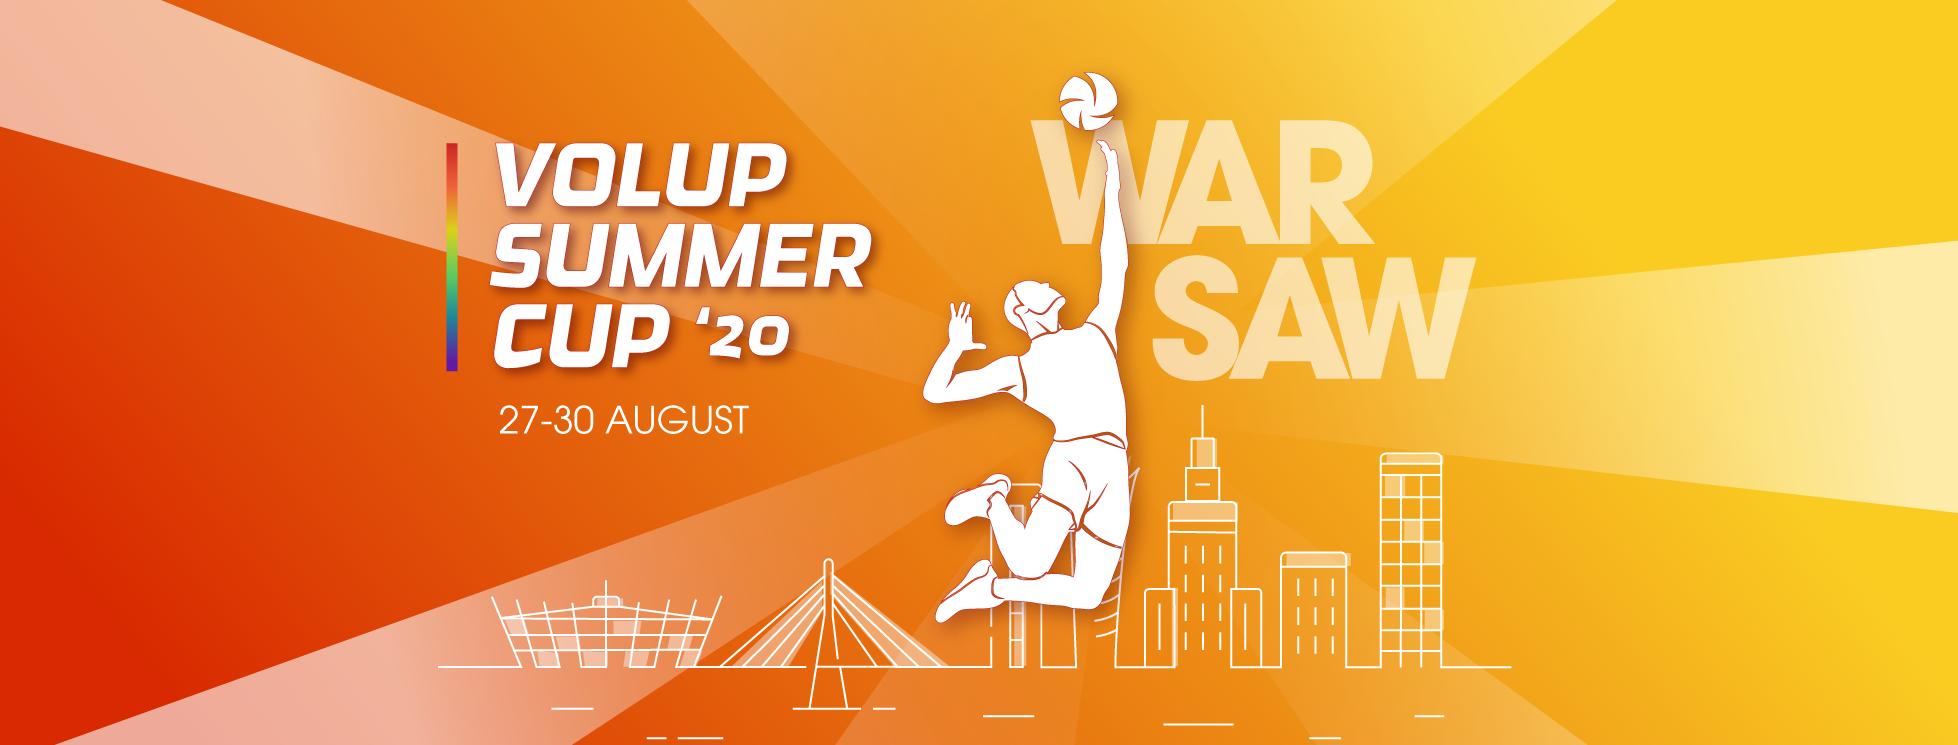 Volup Summer Cup 2020